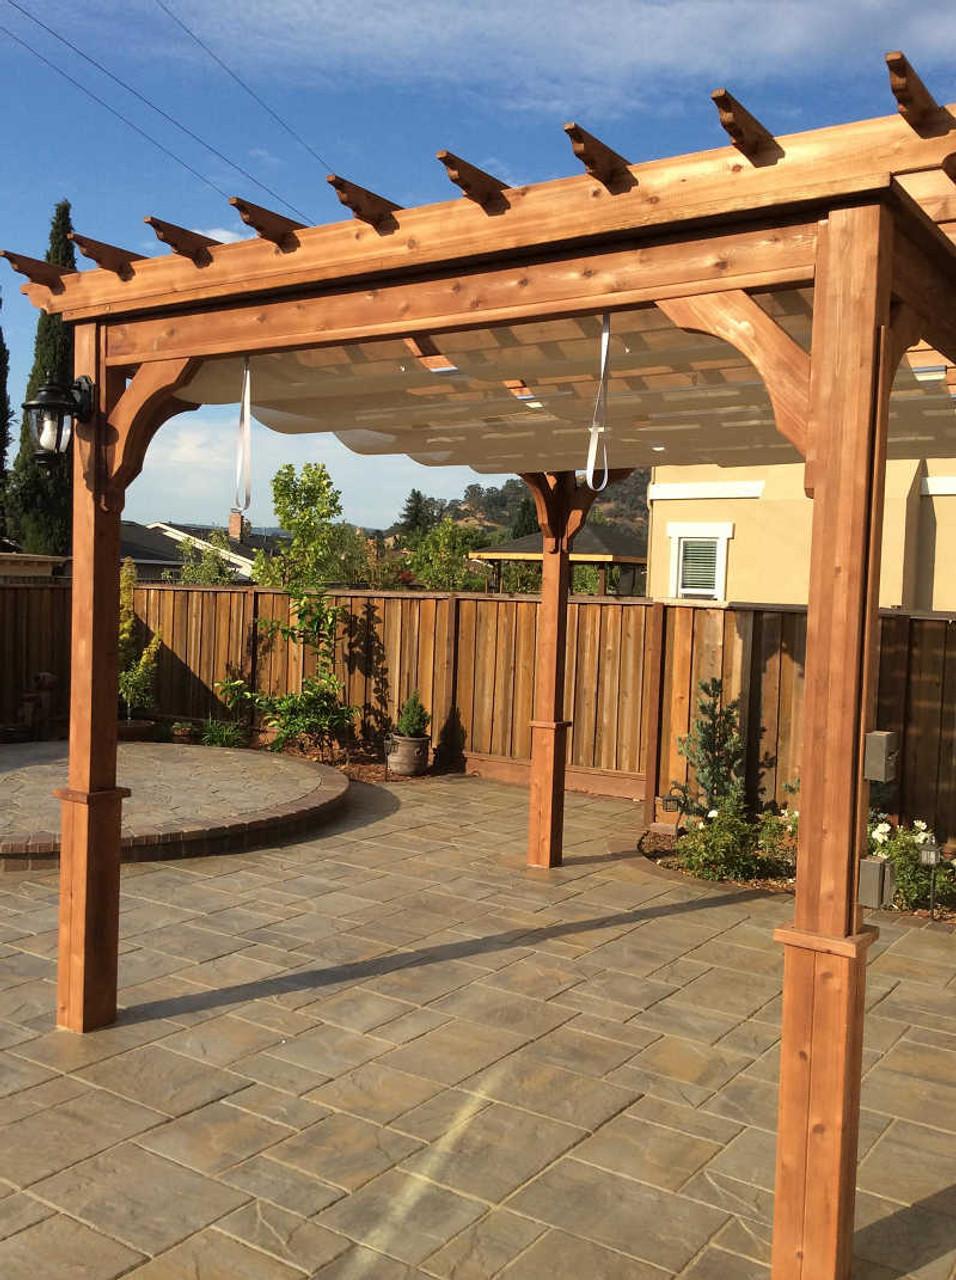 Infinity Canopy / Linen Color / Sunbrella™ Premium Fabric / Serenity Cedar Pergola Kit / Western Red Cedar #1 Grade / Morgan Hill, CA